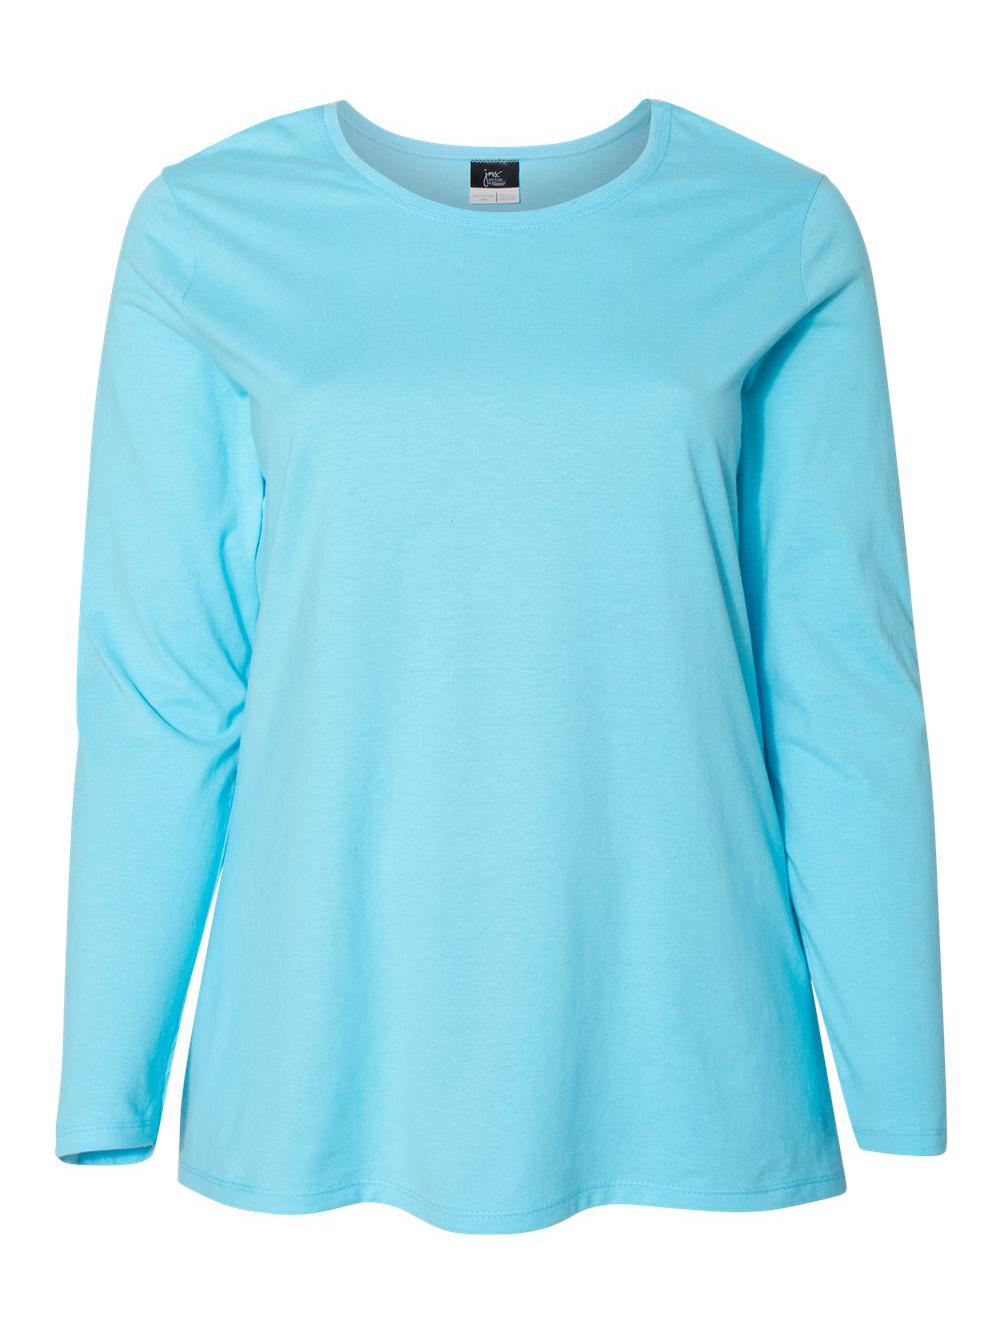 Just-My-Size-Women-039-s-Long-Sleeve-T-Shirt-JMS40 thumbnail 6